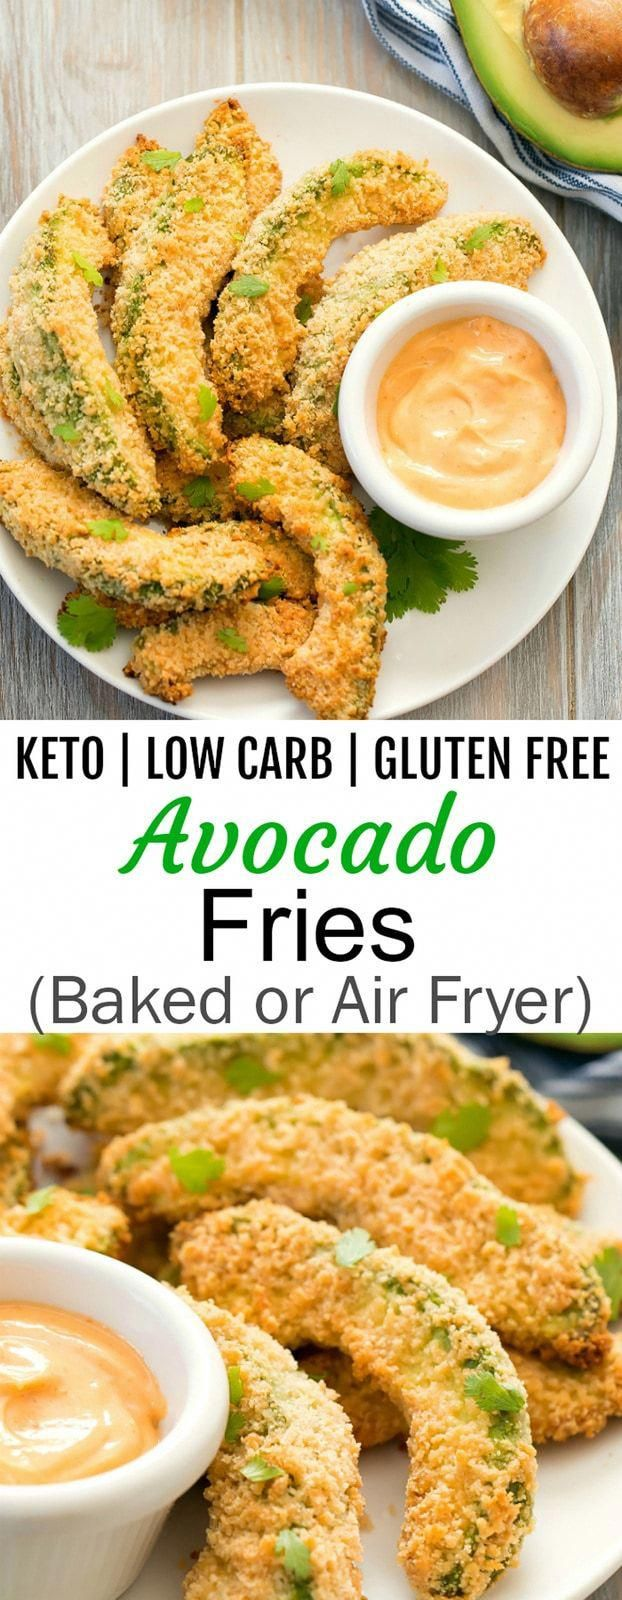 Keto Avocado Fries Recipe in 2020 Air fryer recipes